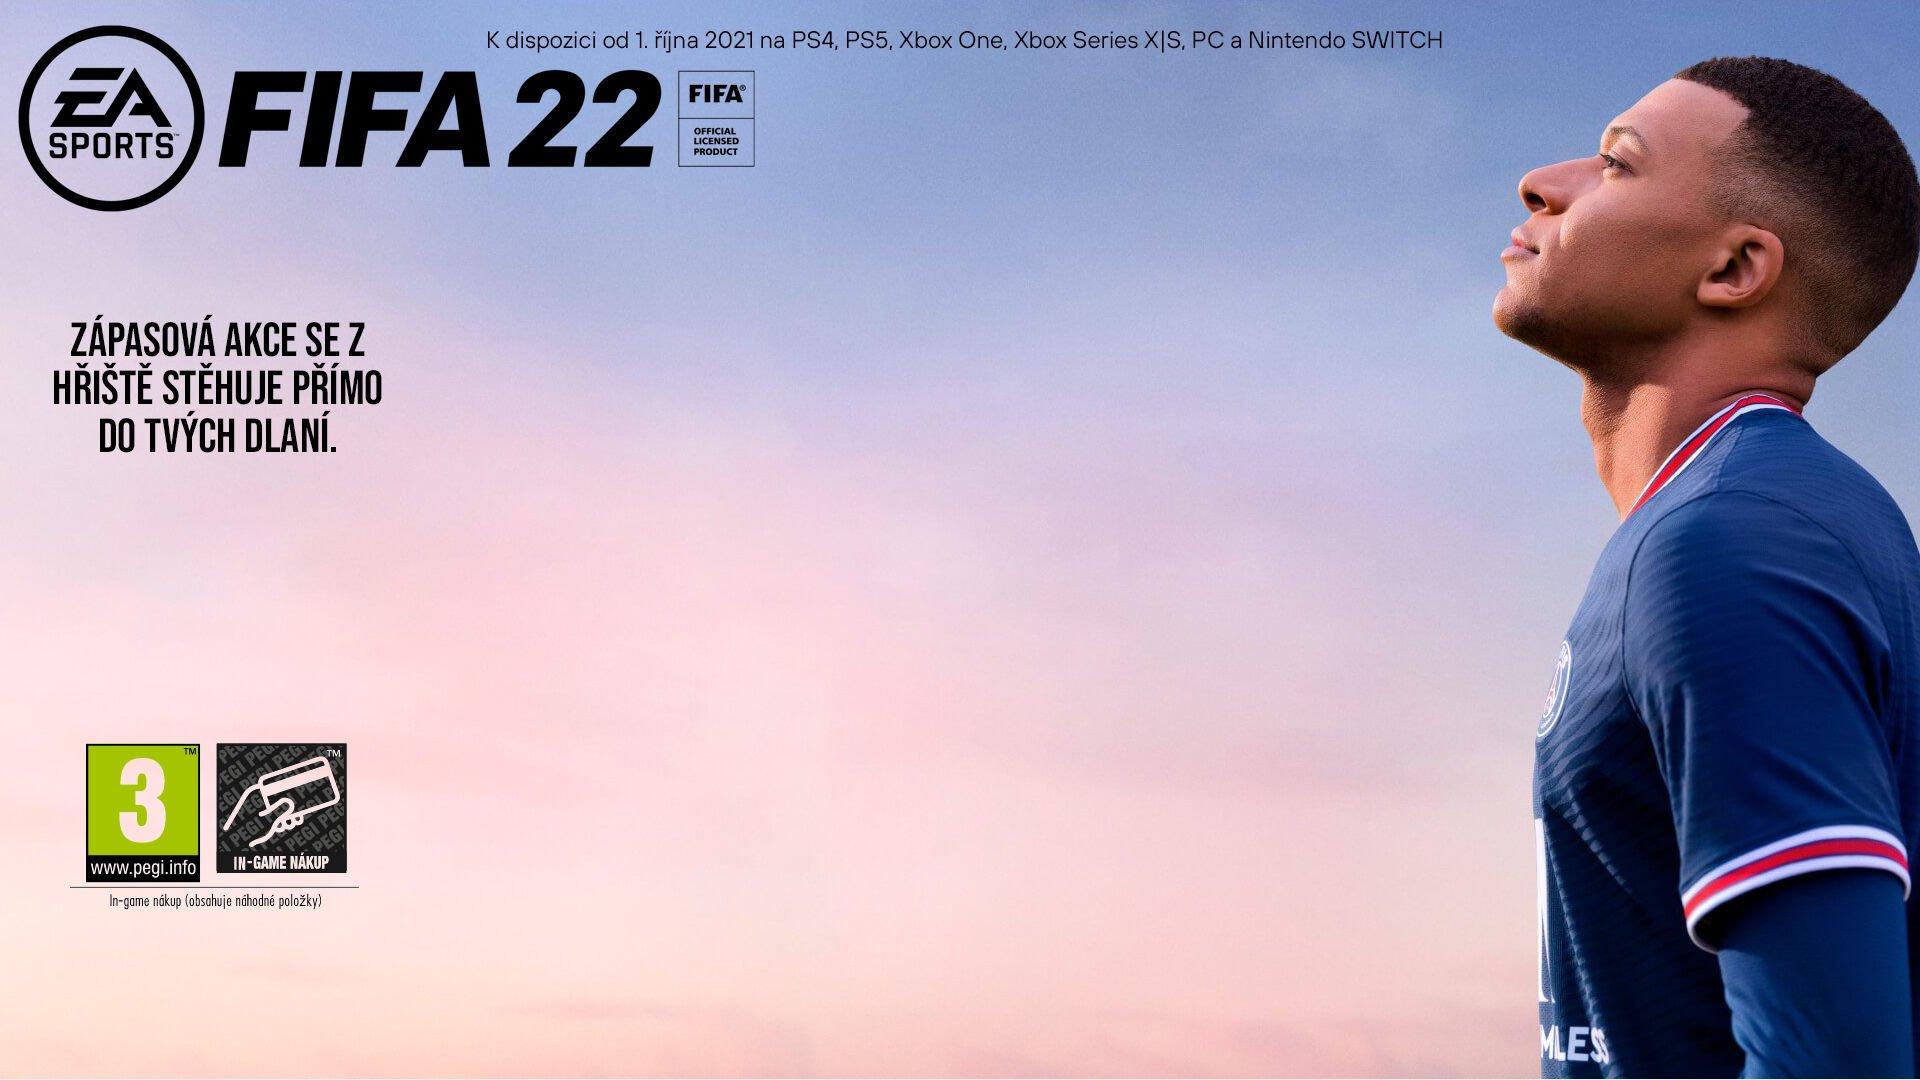 GAMEHOUSE FIFA 22